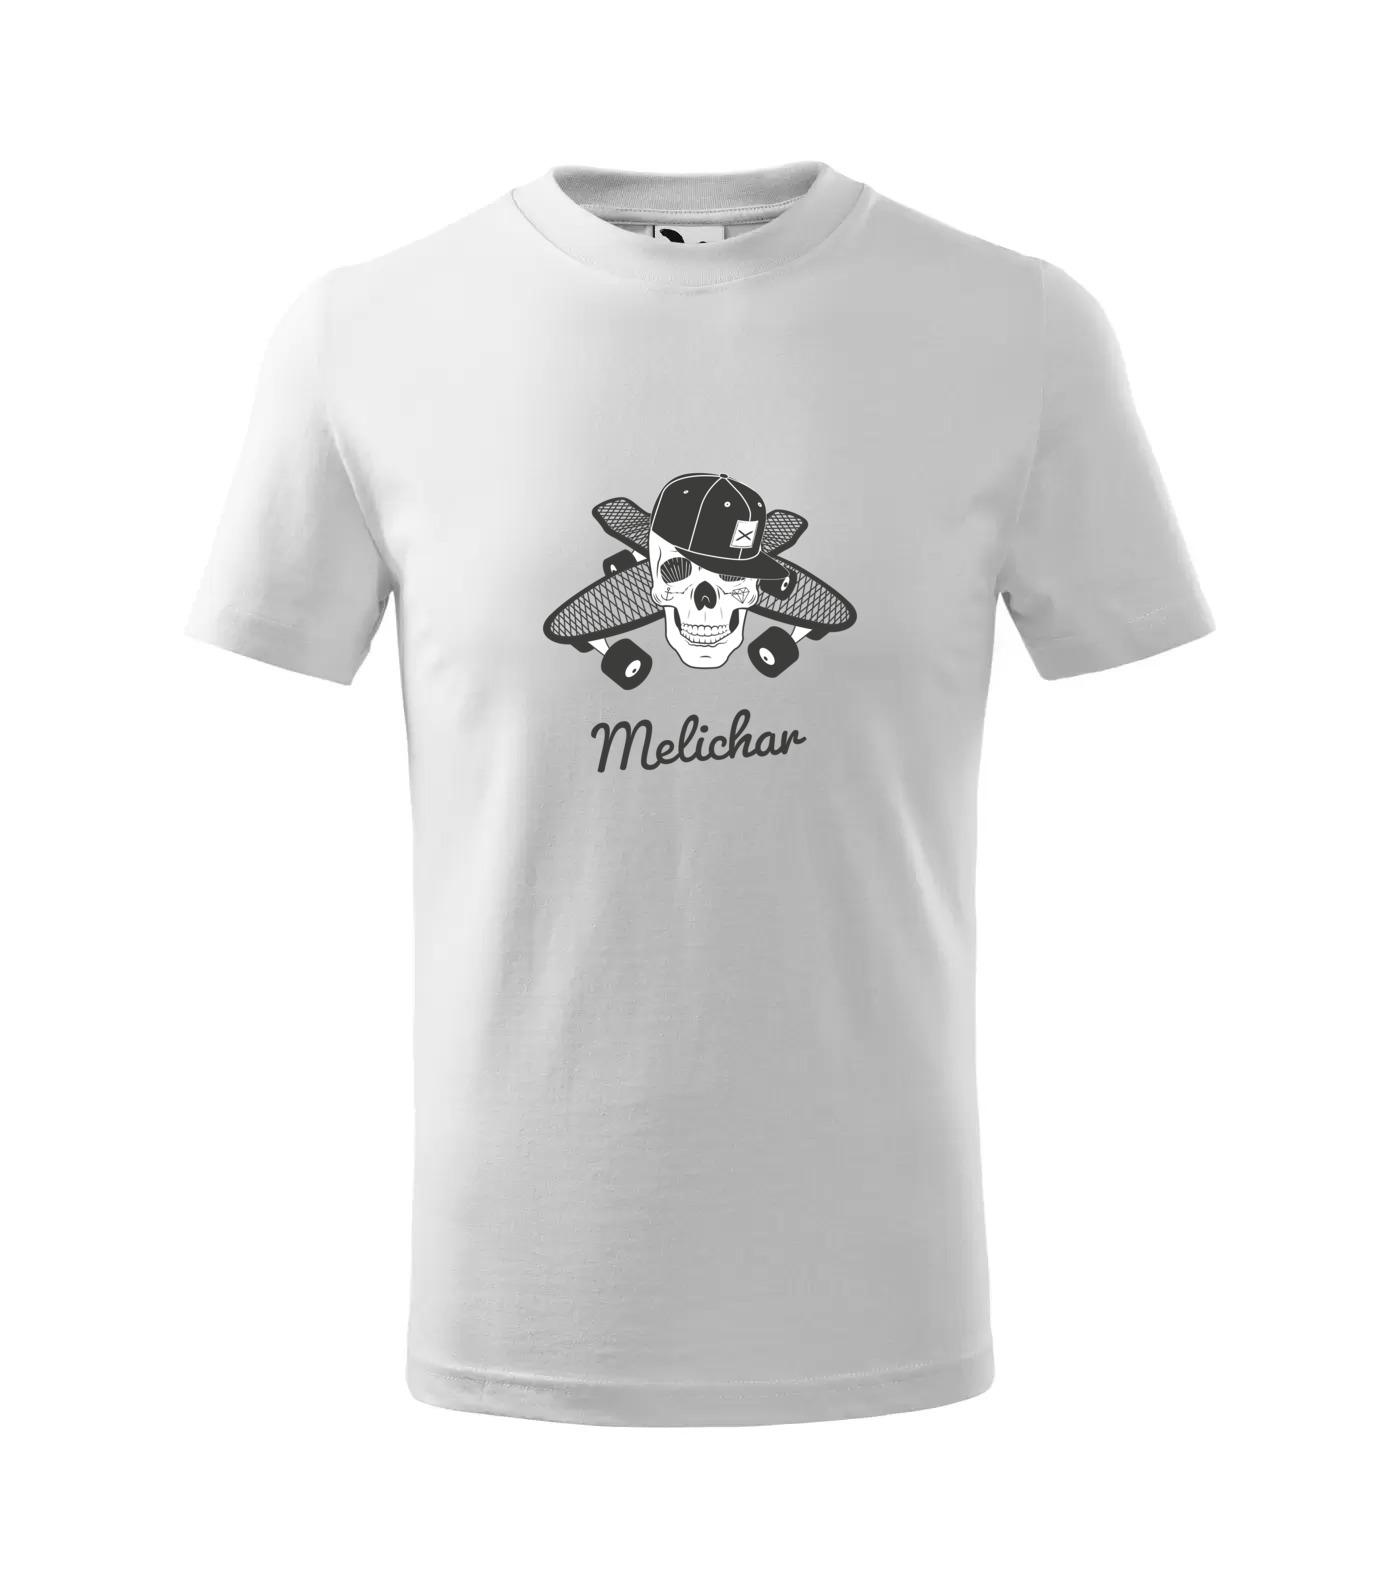 Tričko Skejťák Melichar